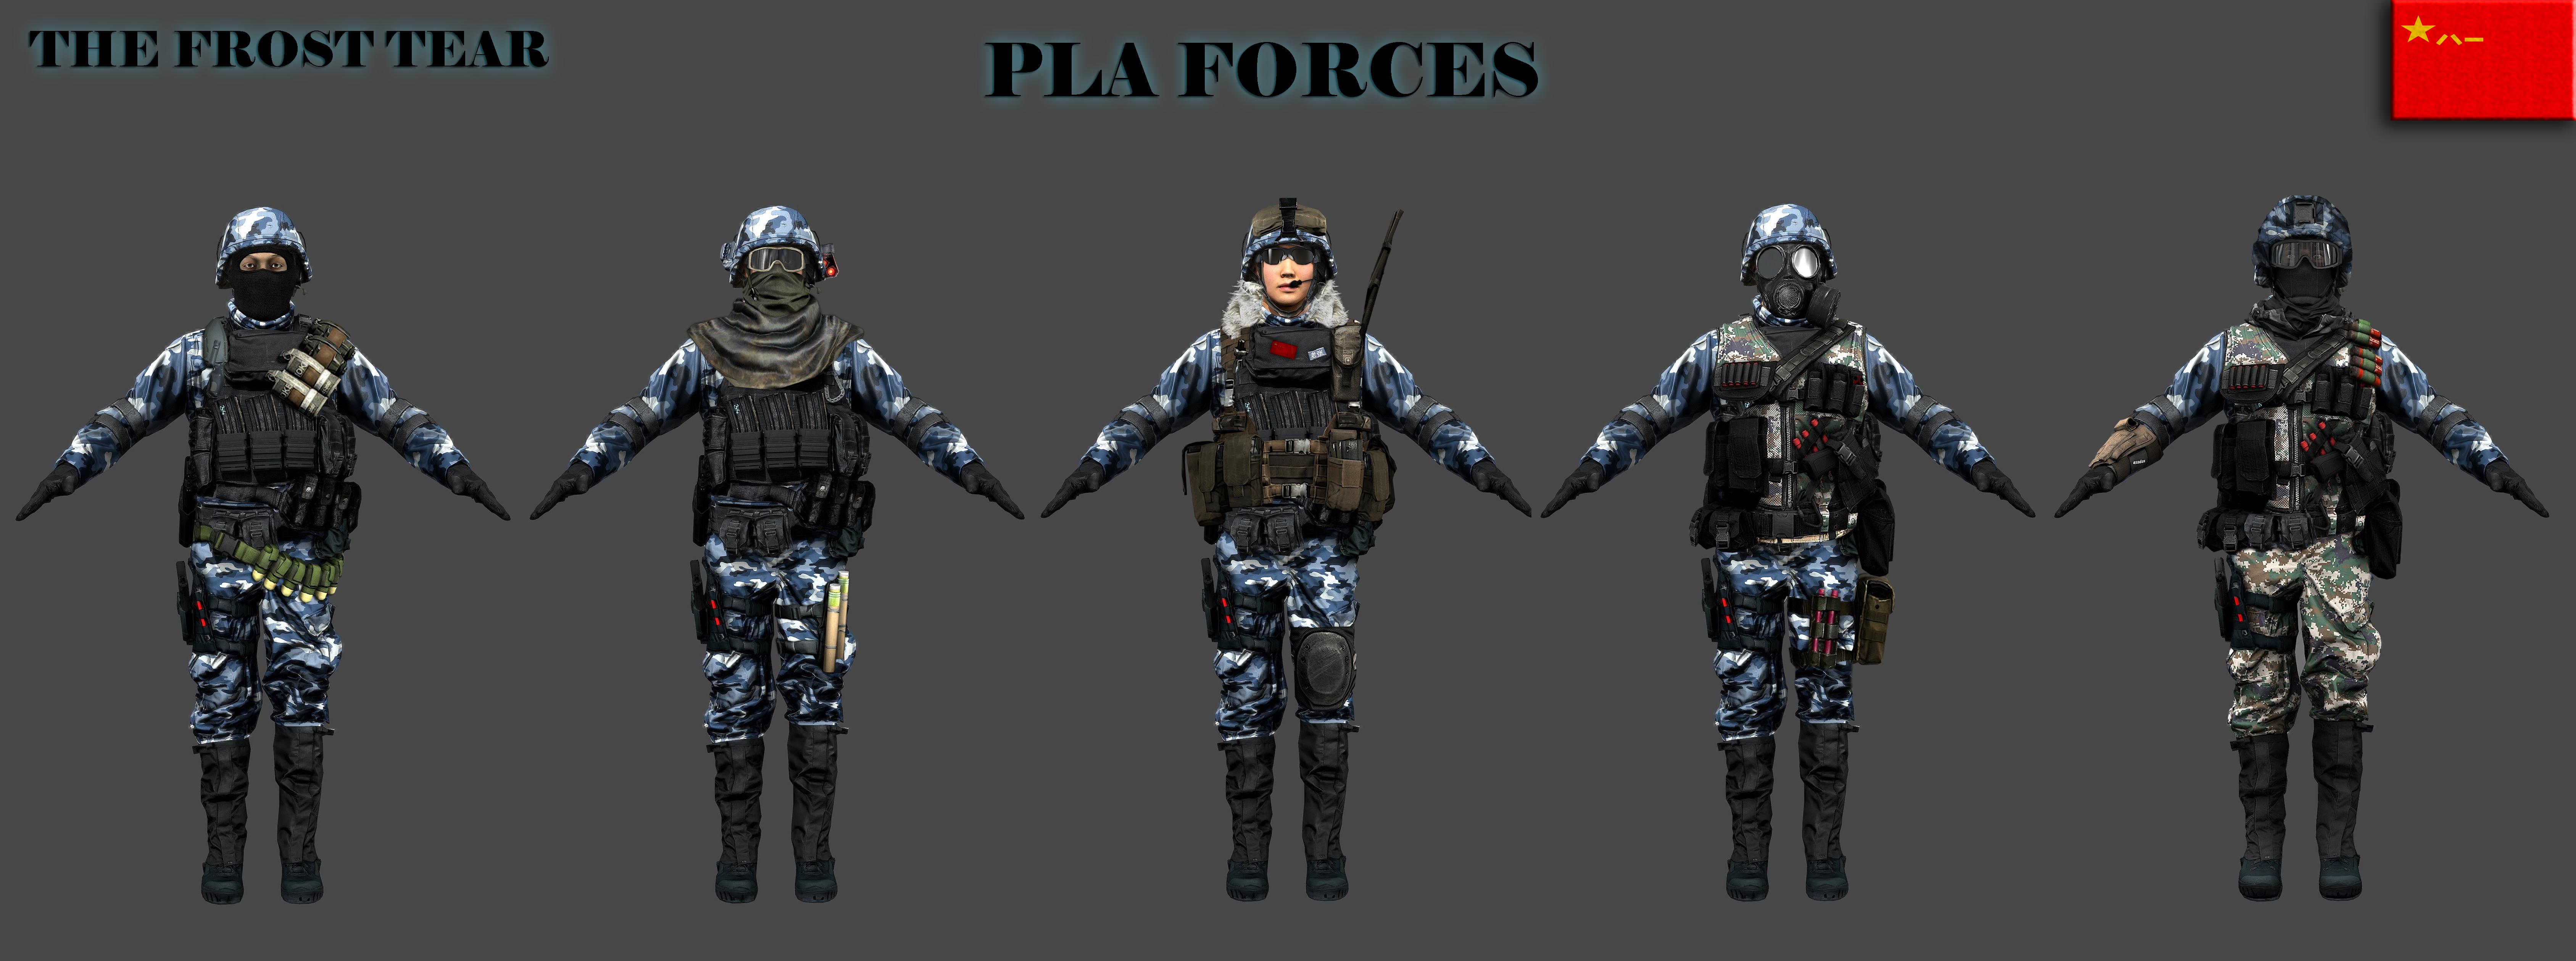 TfT PLA Forces by Milosh--Andrich on DeviantArt